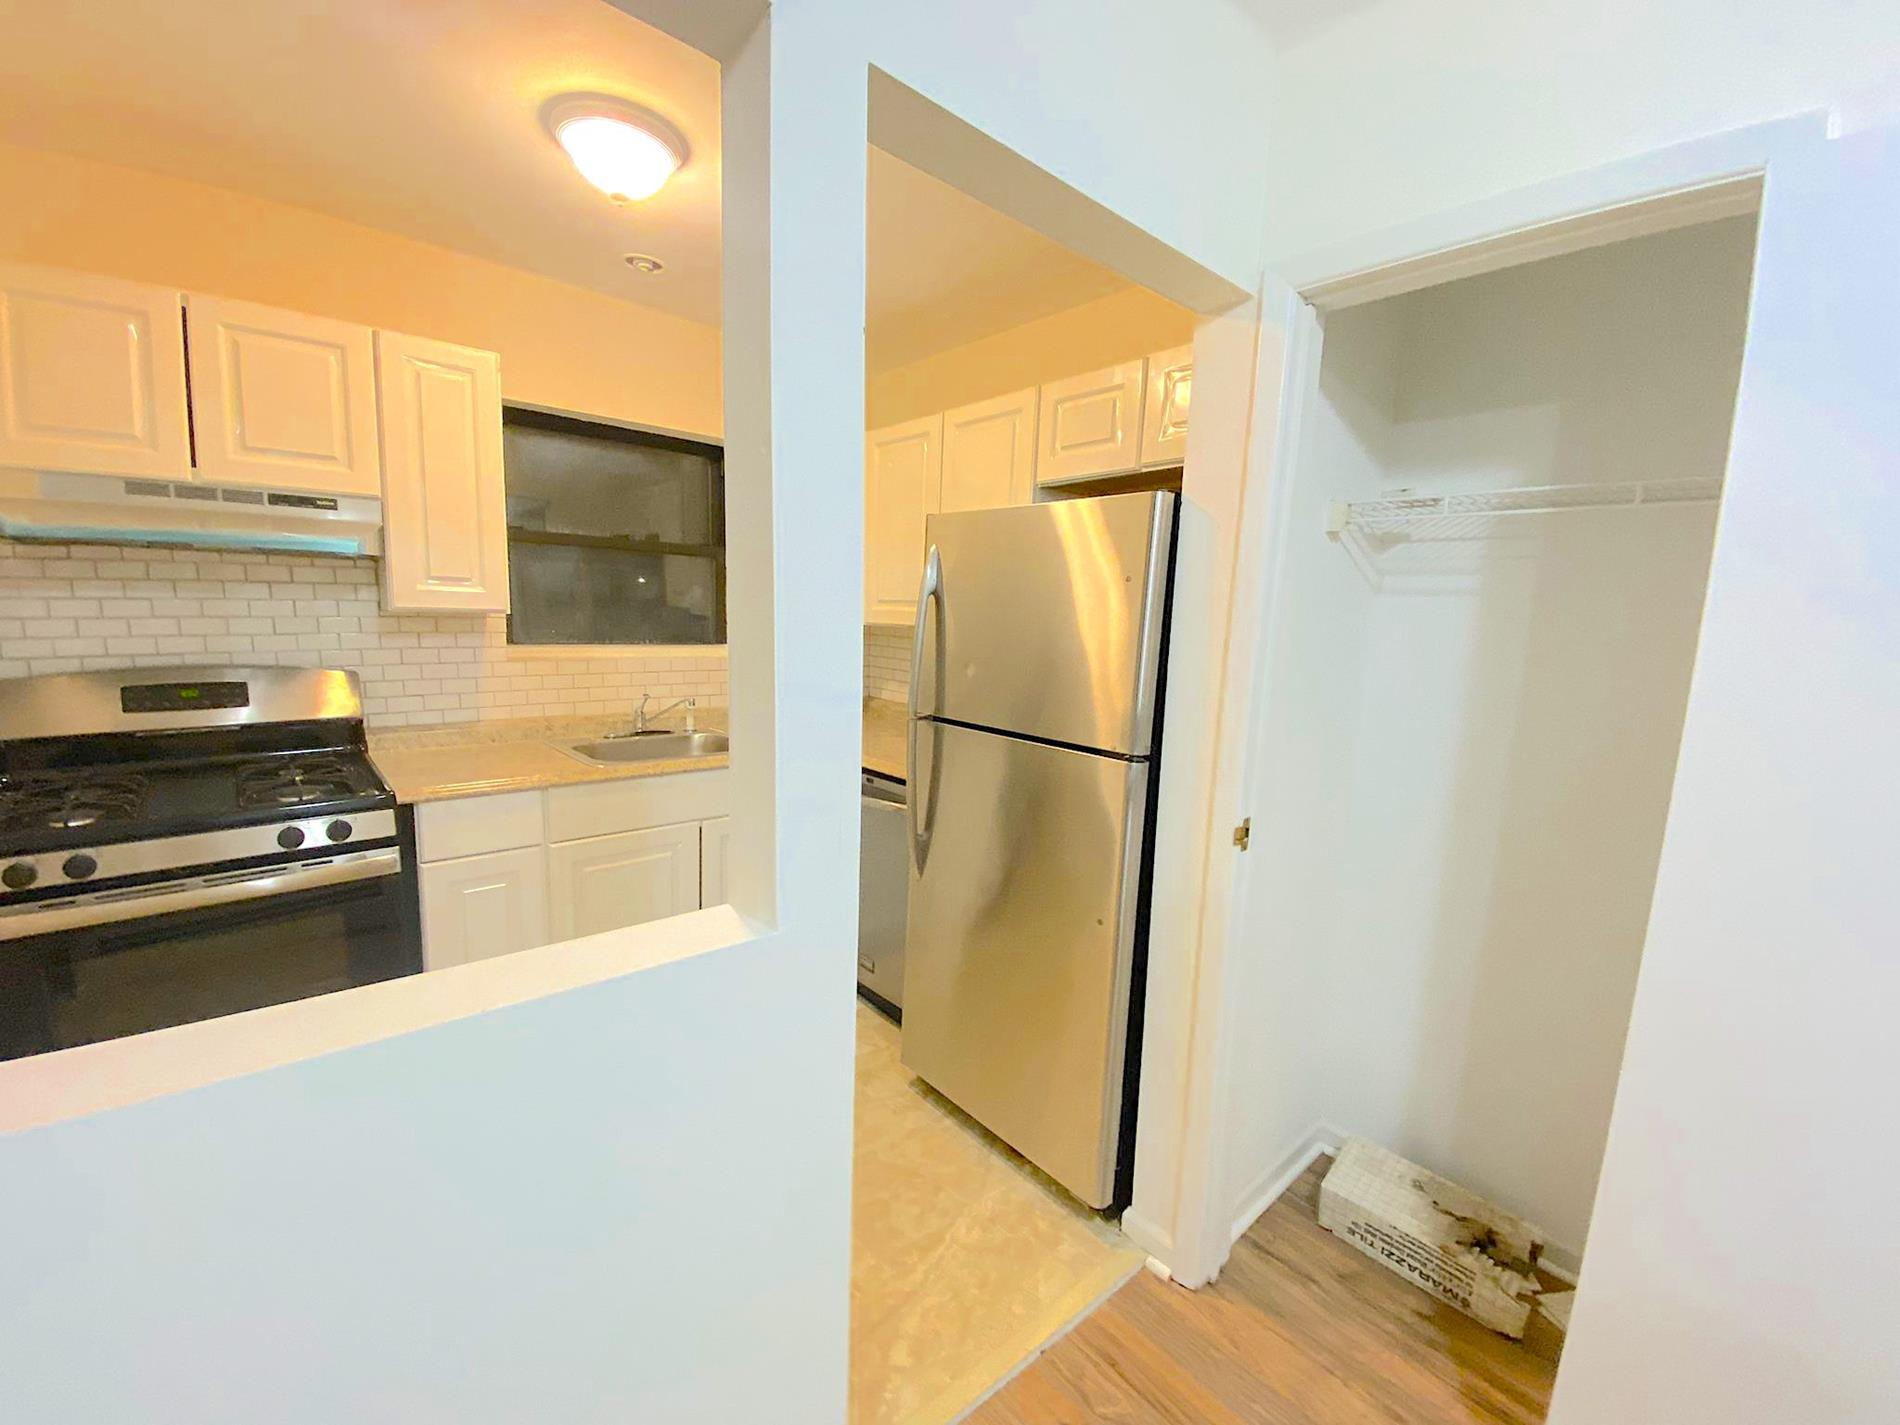 972 East 88th Street Paerdegat Basin Brooklyn NY 11236